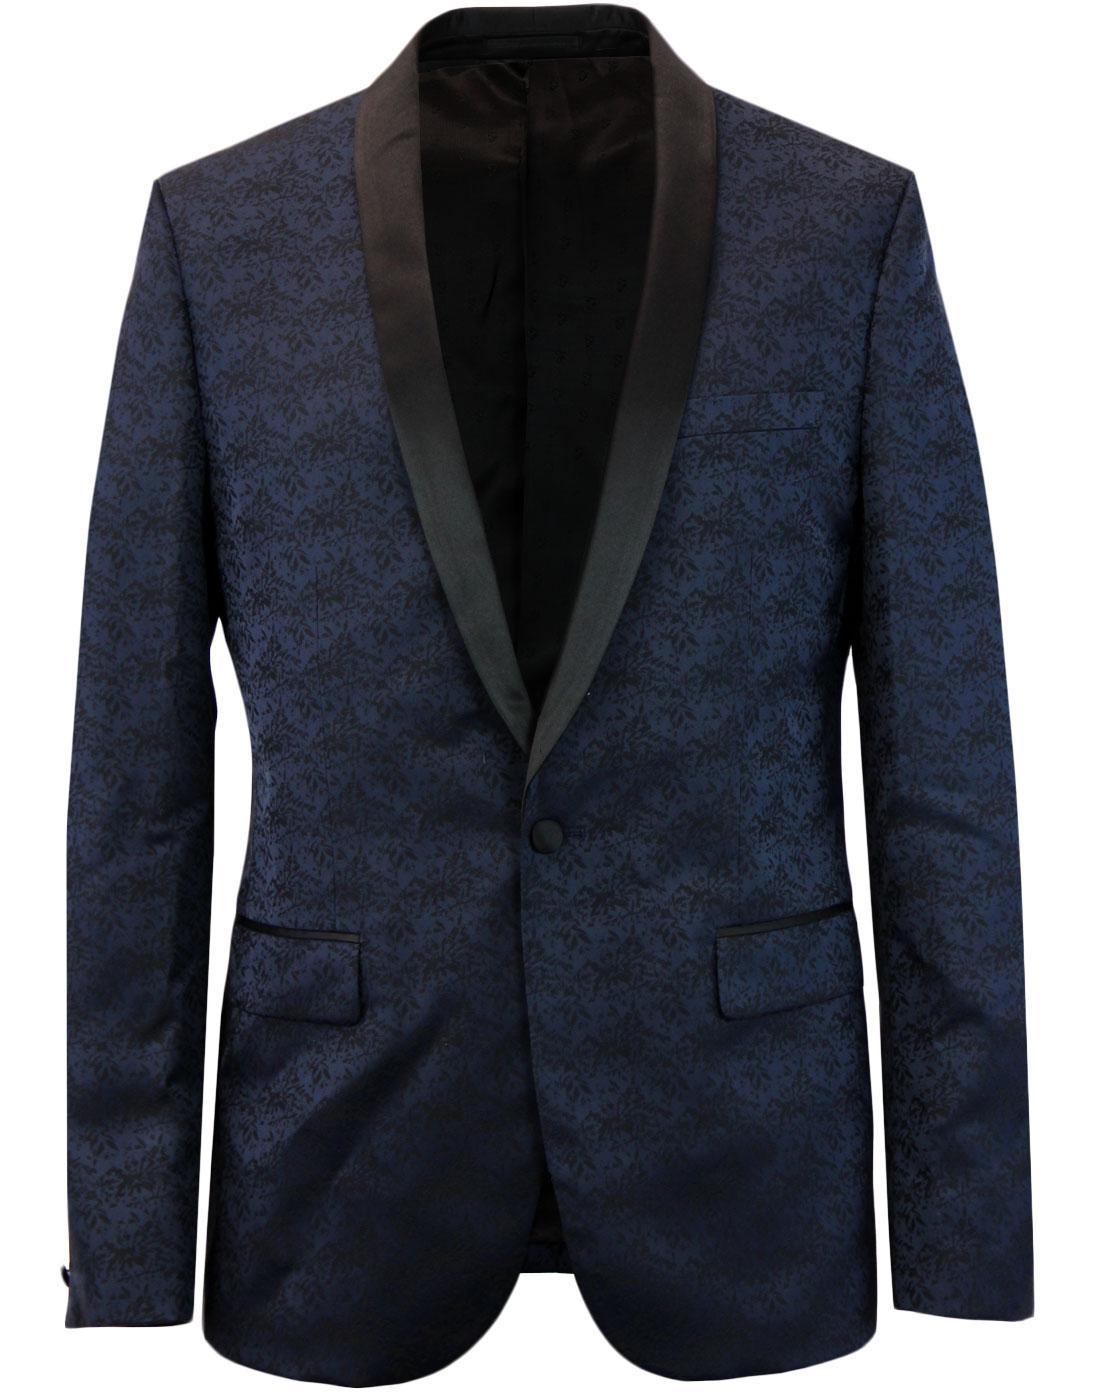 Keeling FARAH 60s Mod Floral Jacquard Suit Jacket